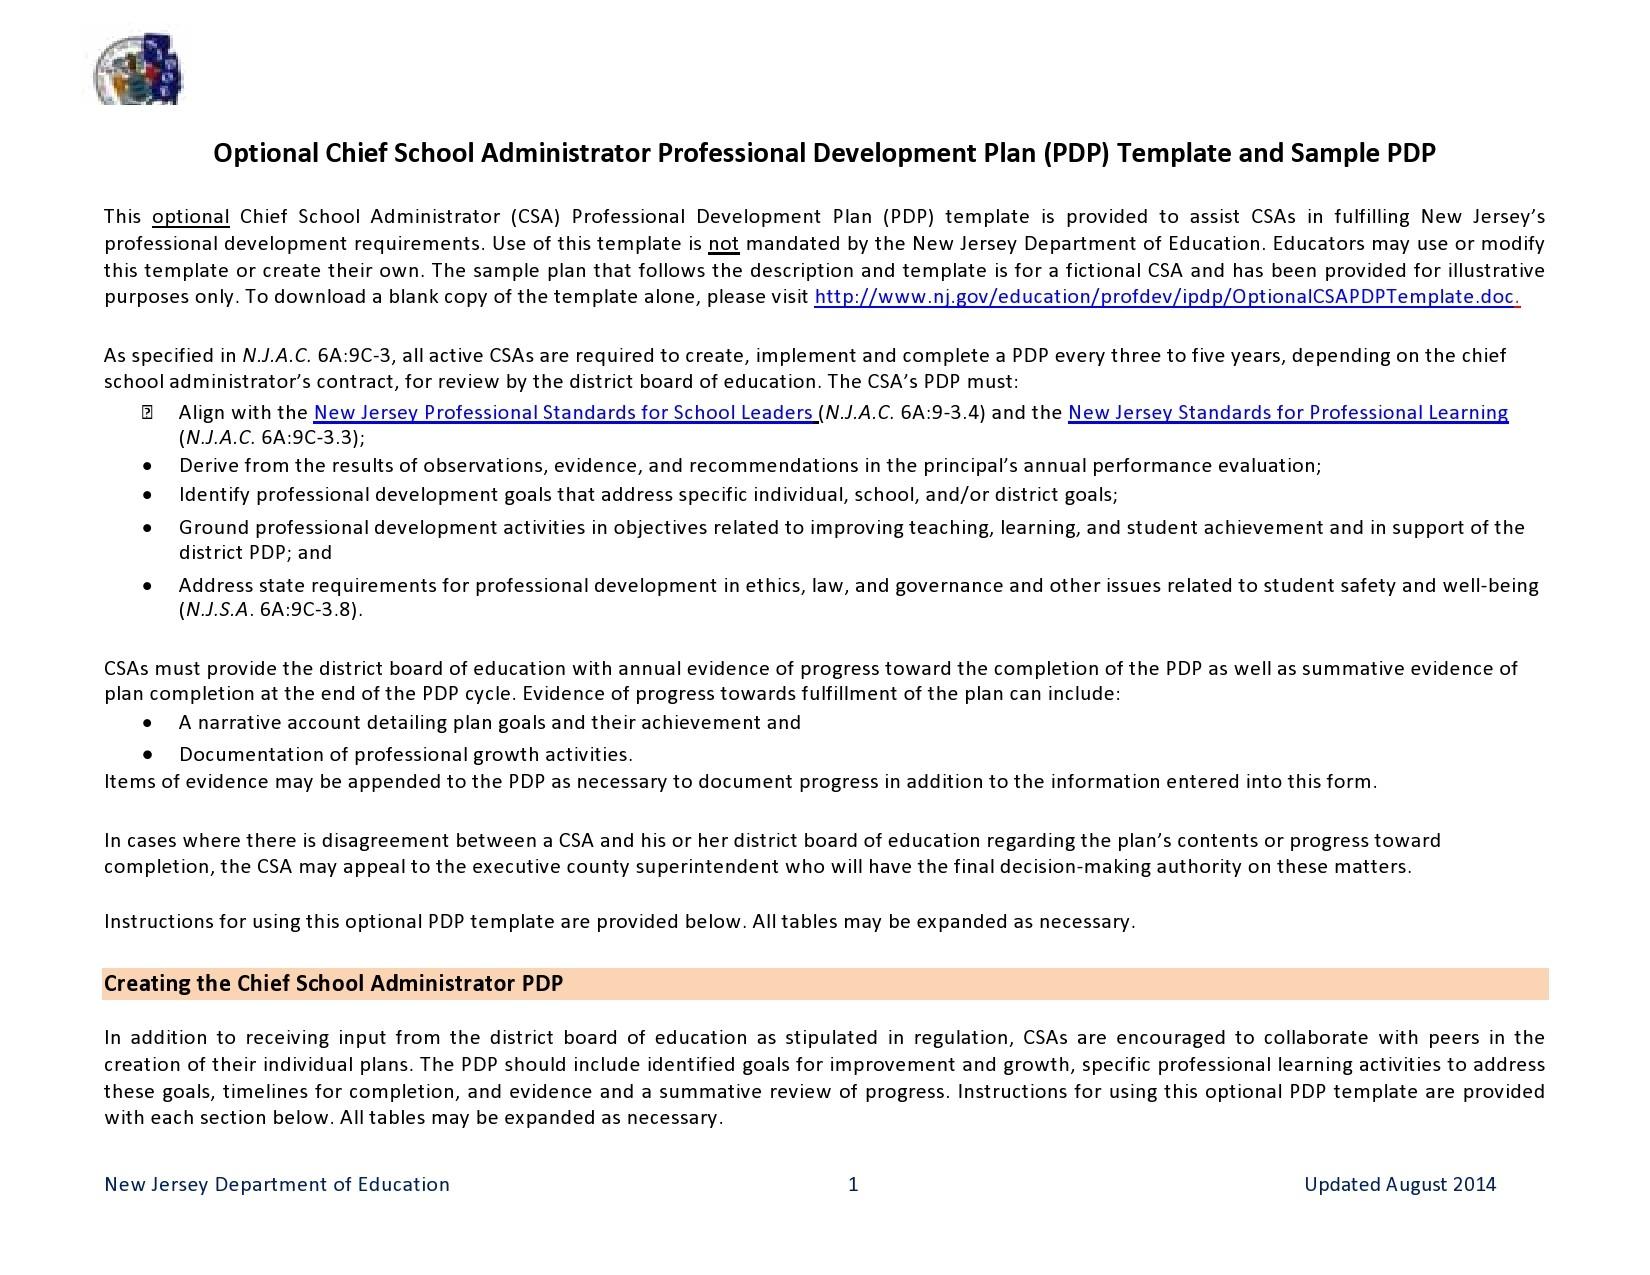 Free professional development plan 07